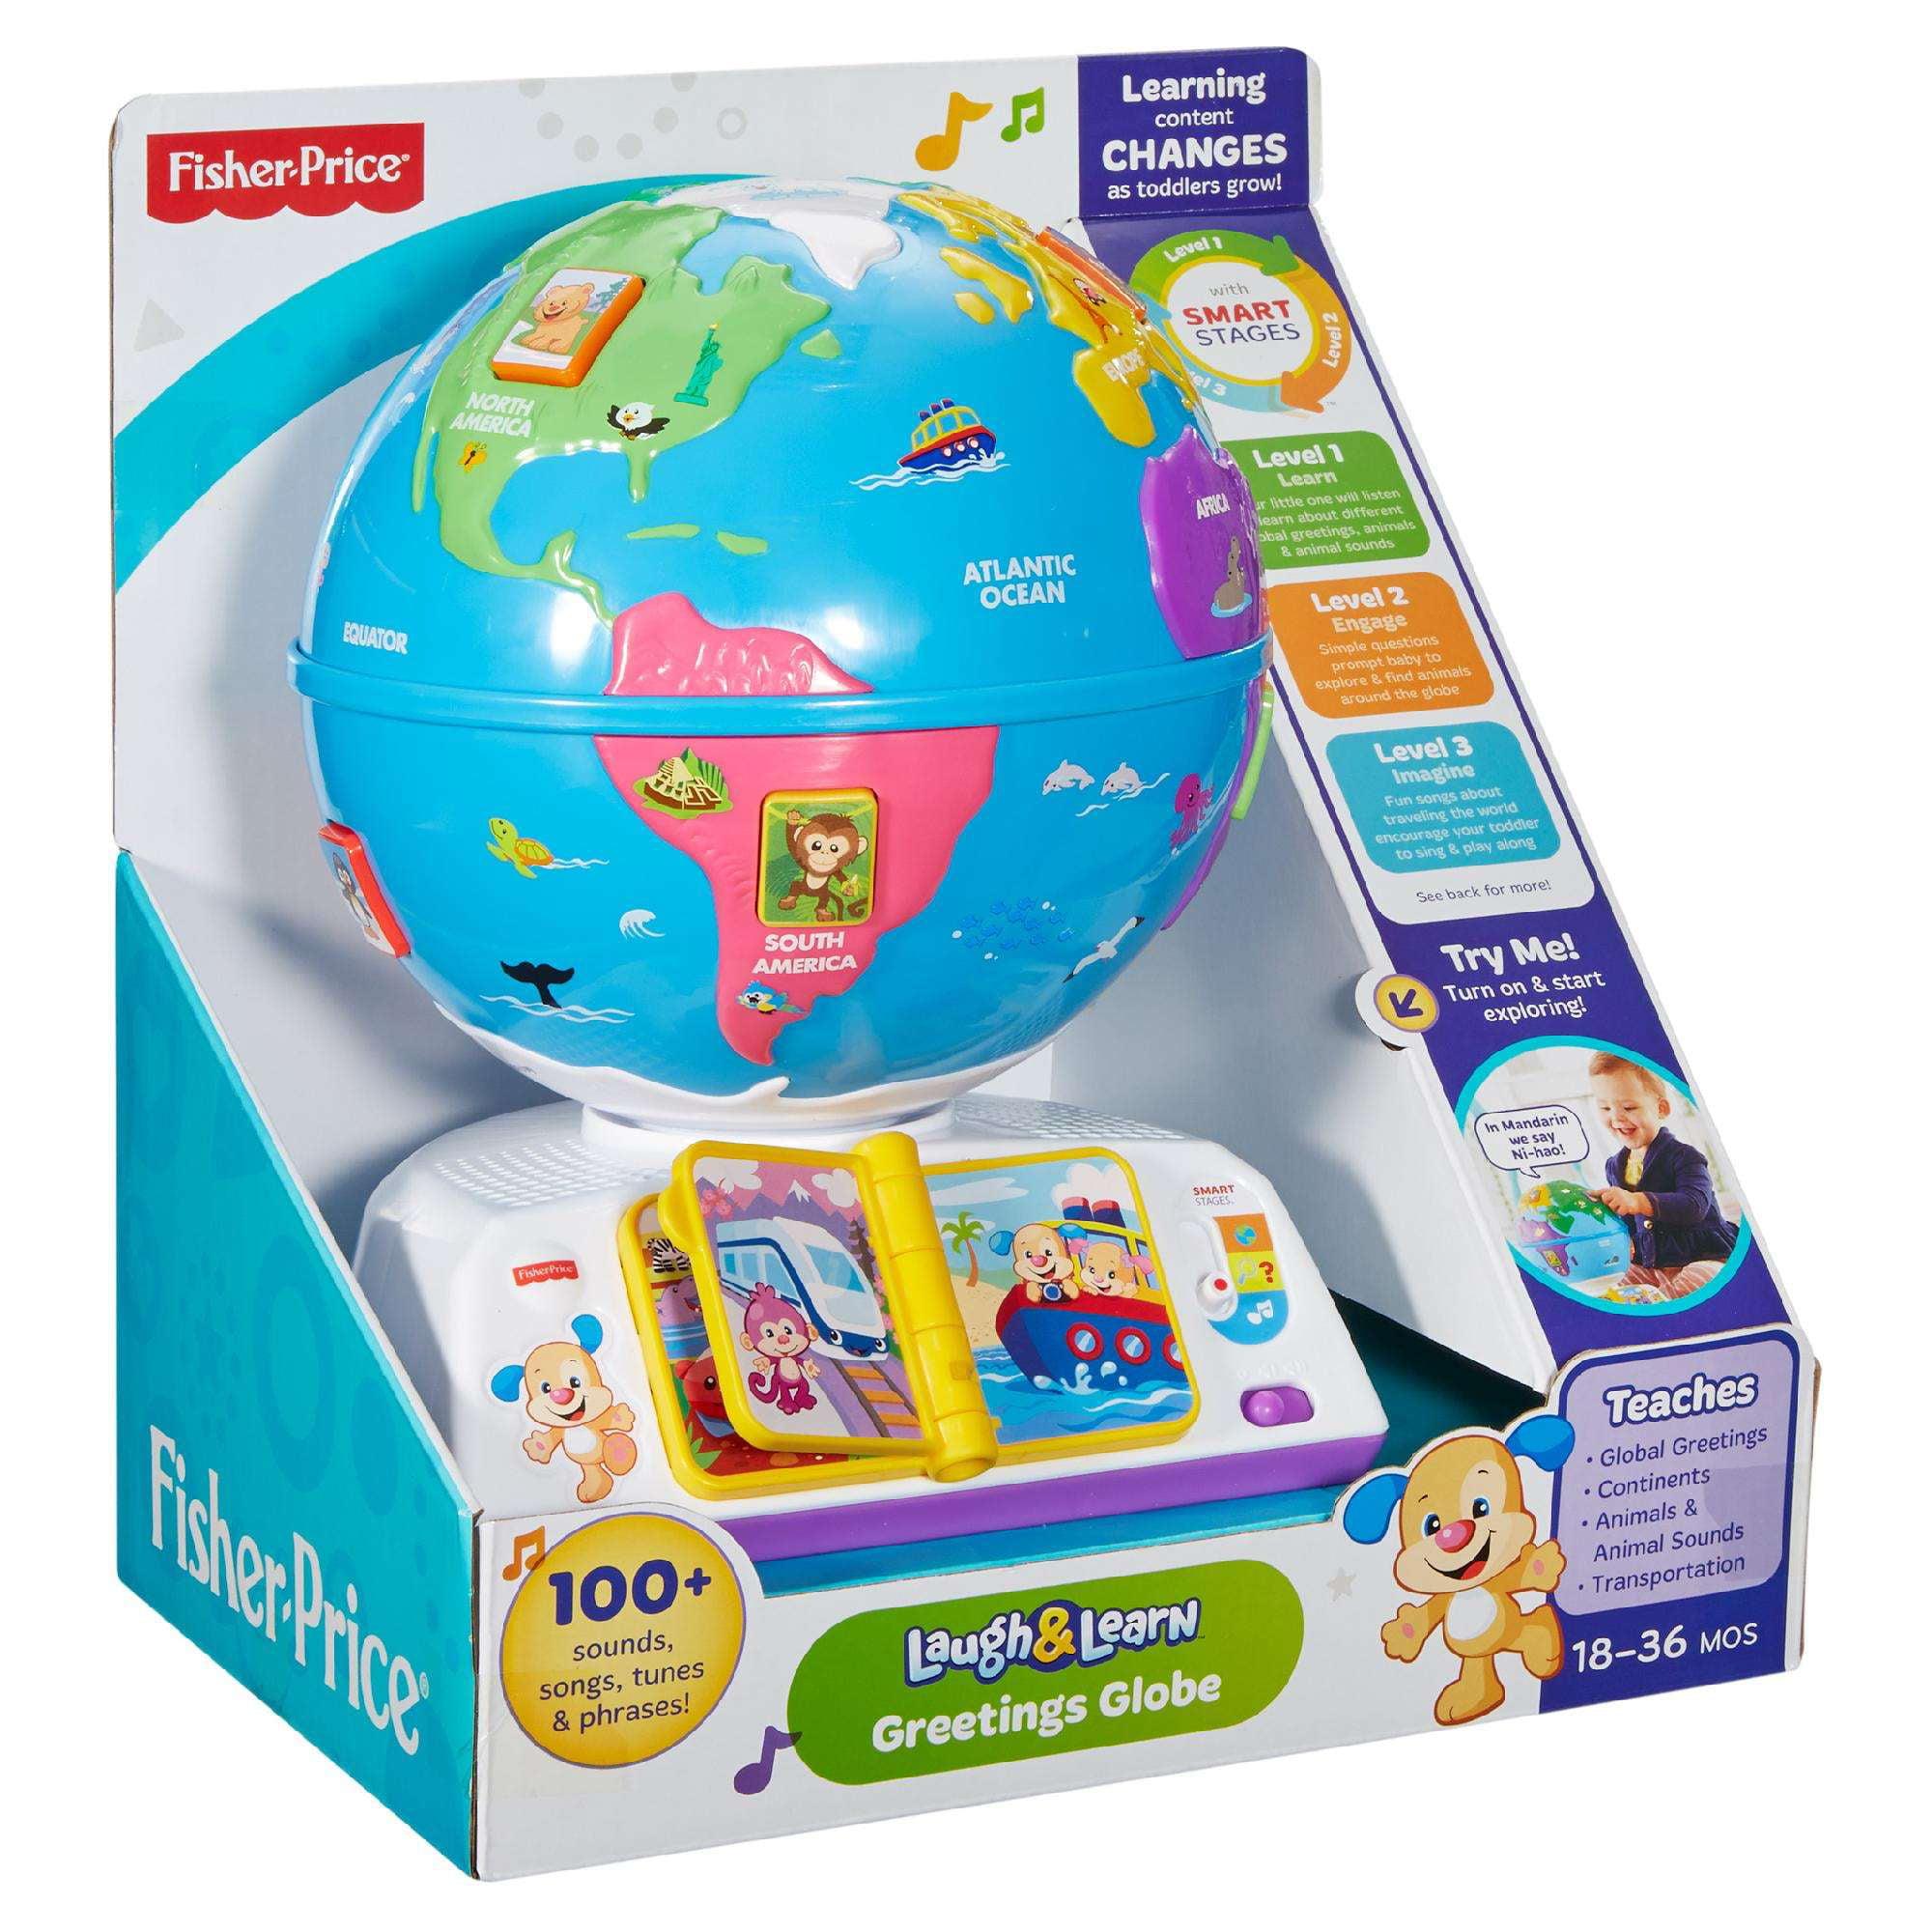 Fisher-Price Laugh & Learn Greetings Globe - Walmart.com